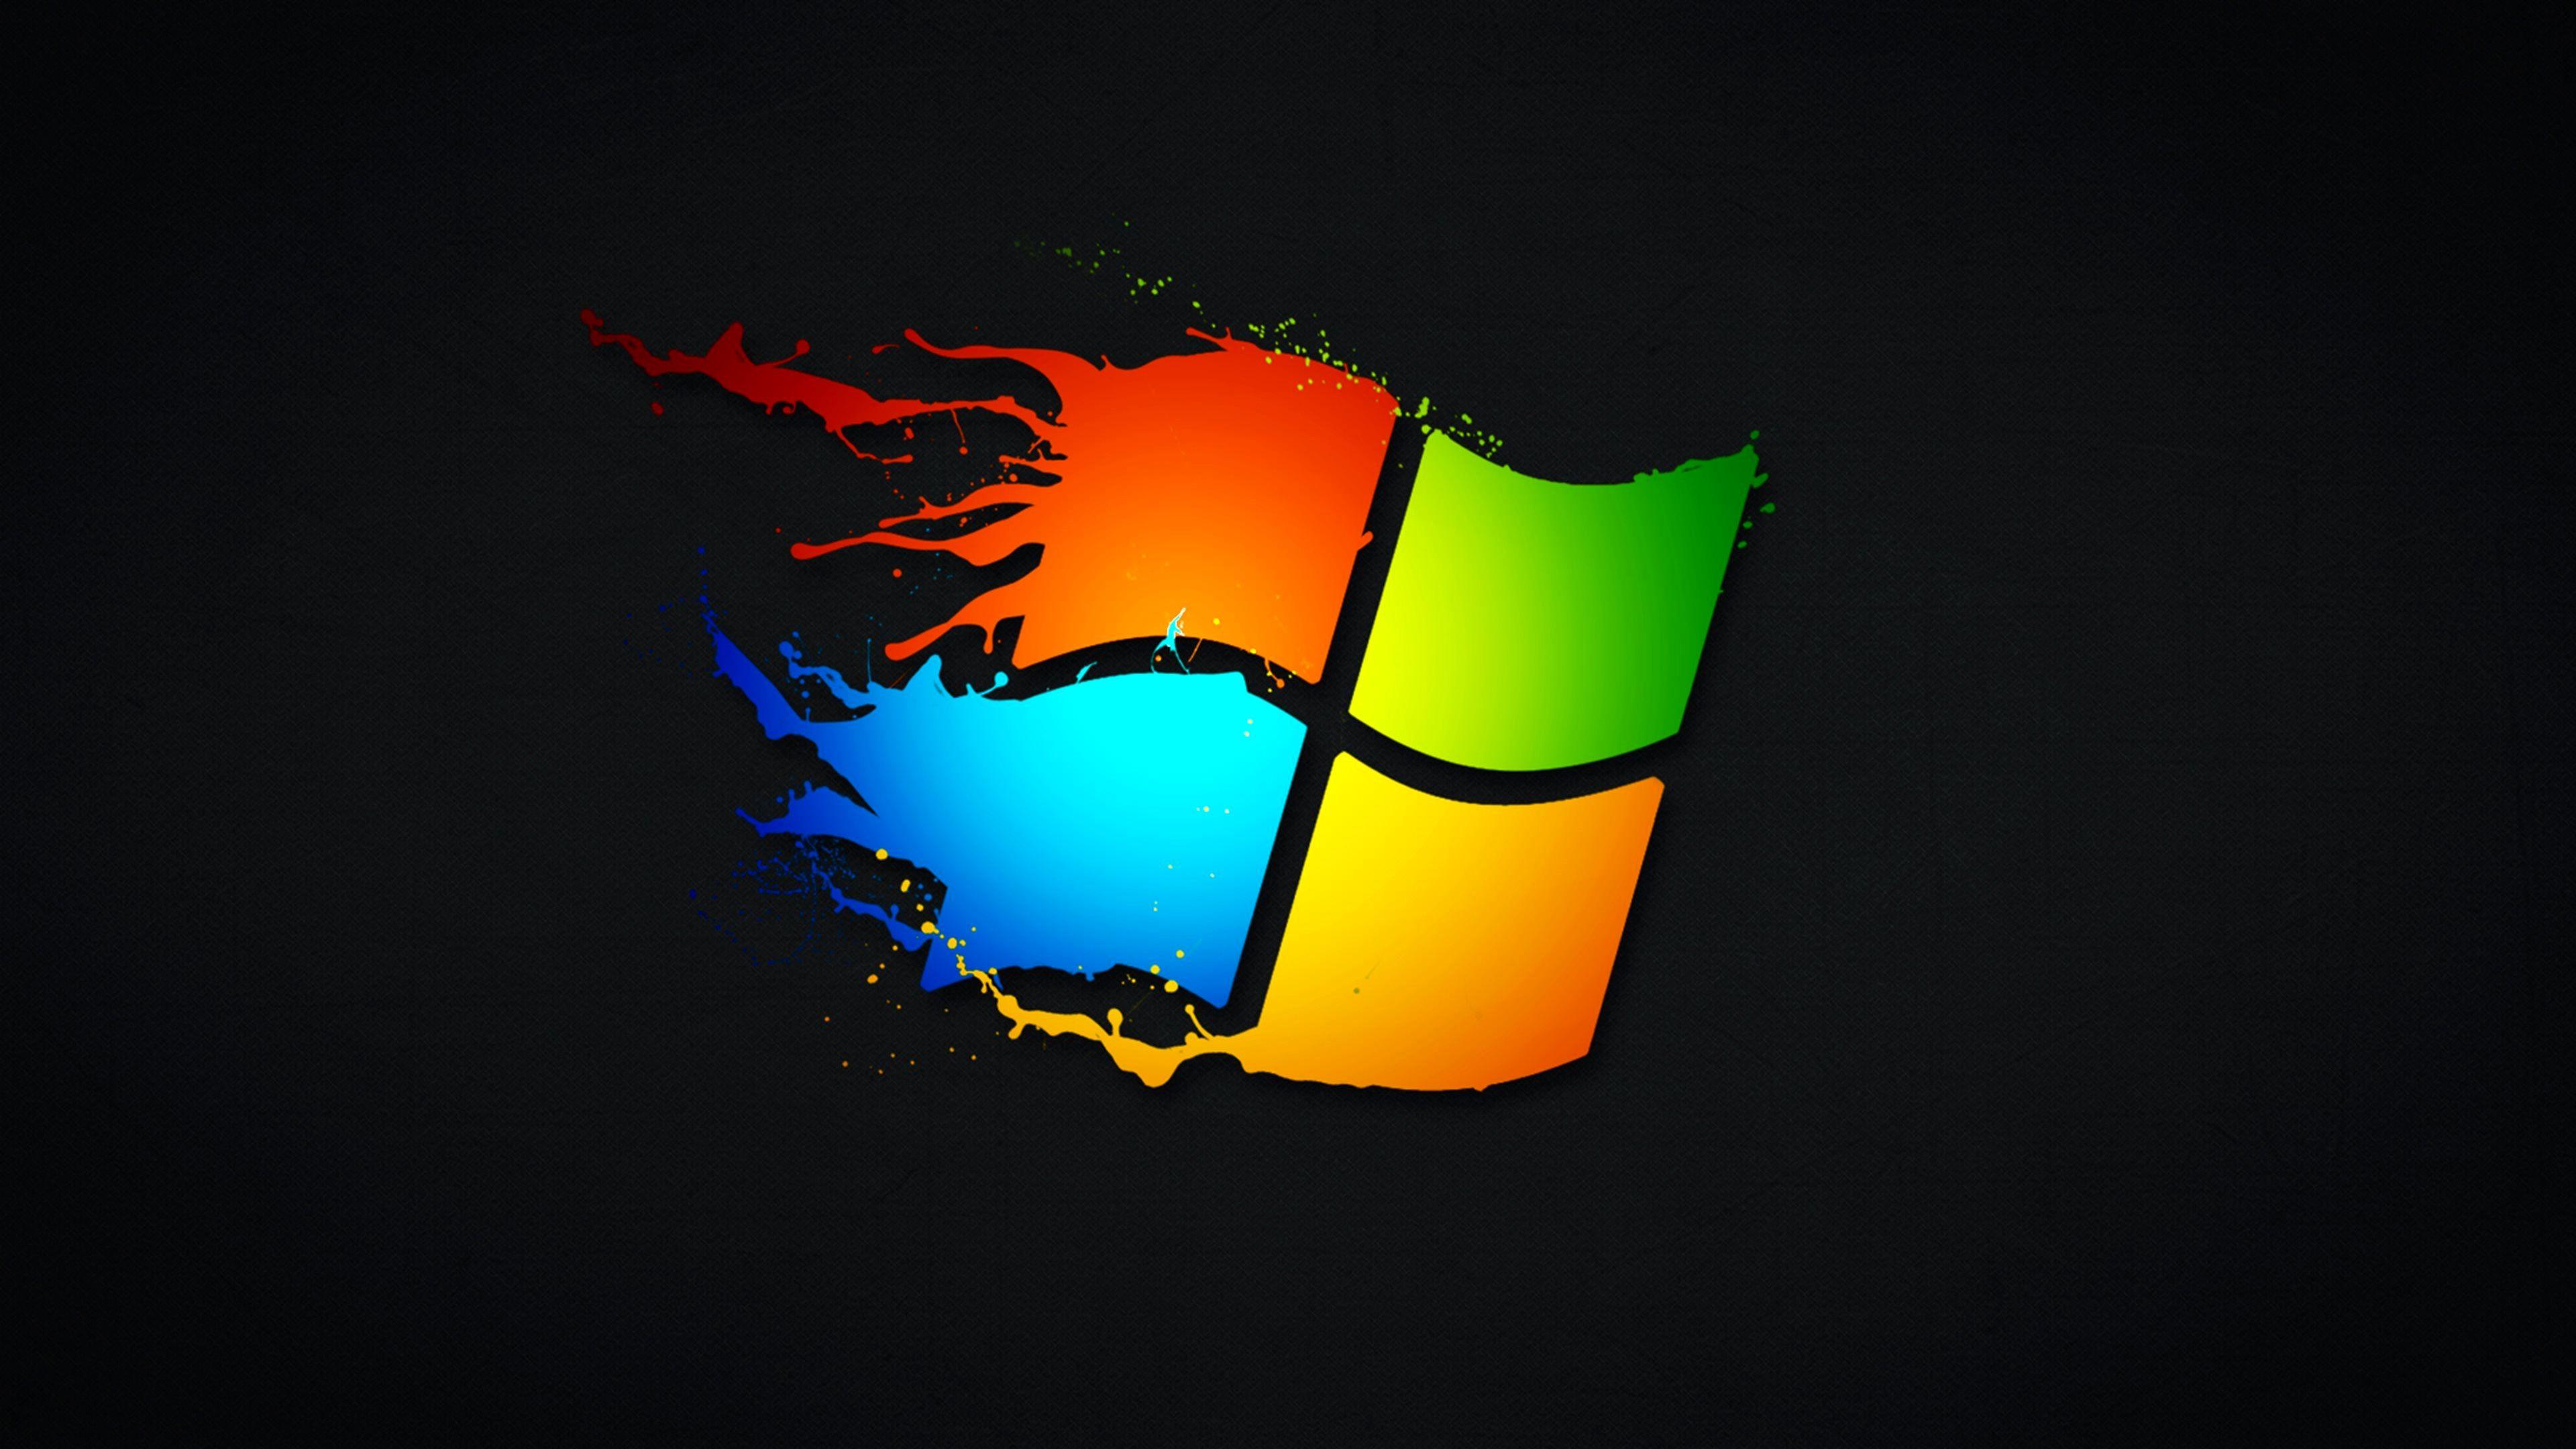 Gaming Wallpaper 4K For Windows 10 Ideas Check more at